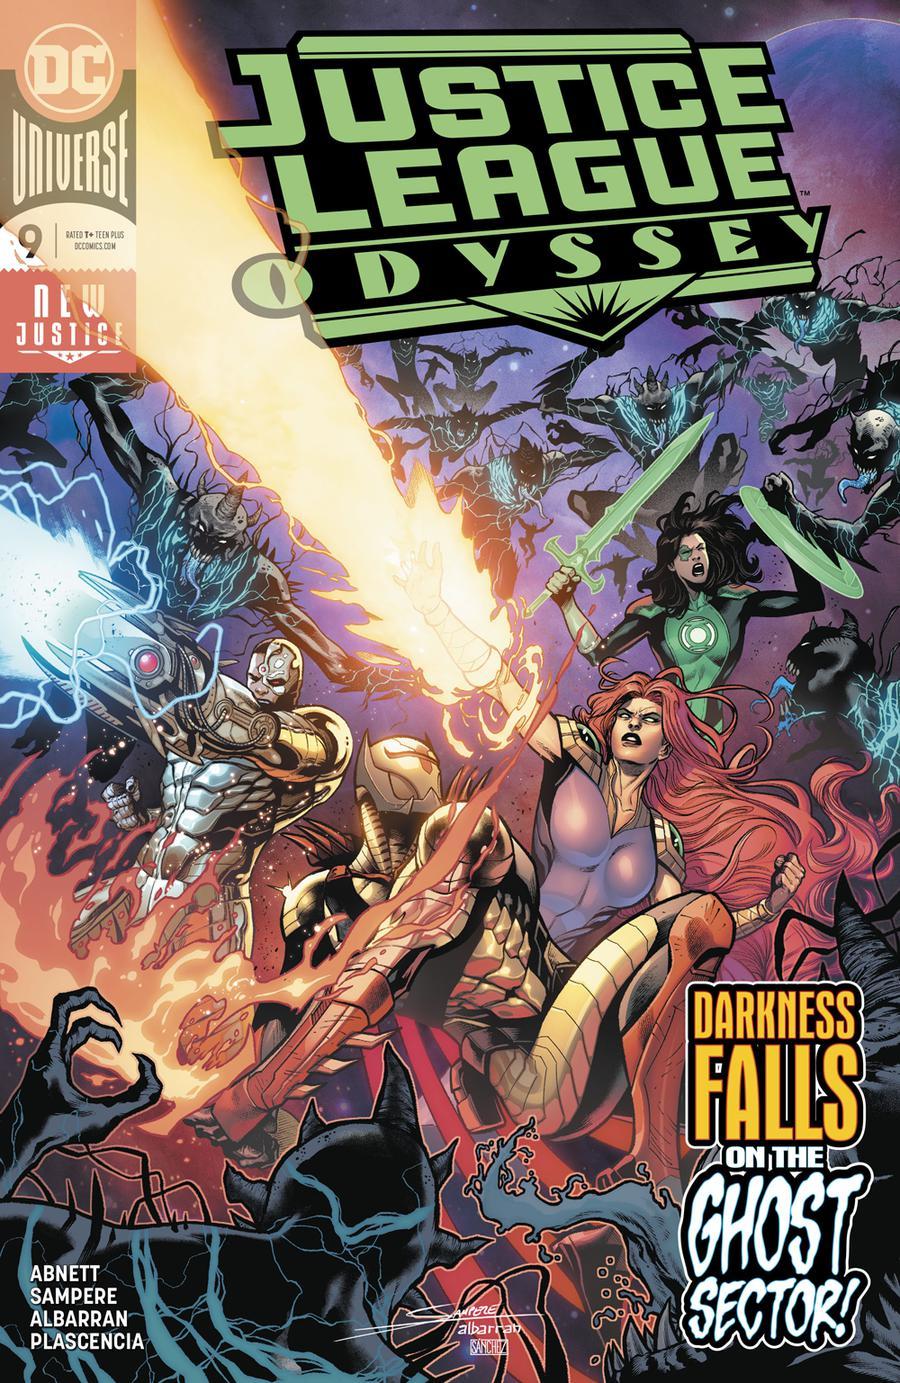 Justice League Odyssey #9 Cover A Regular Daniel Sampere & Juan Albarran Cover